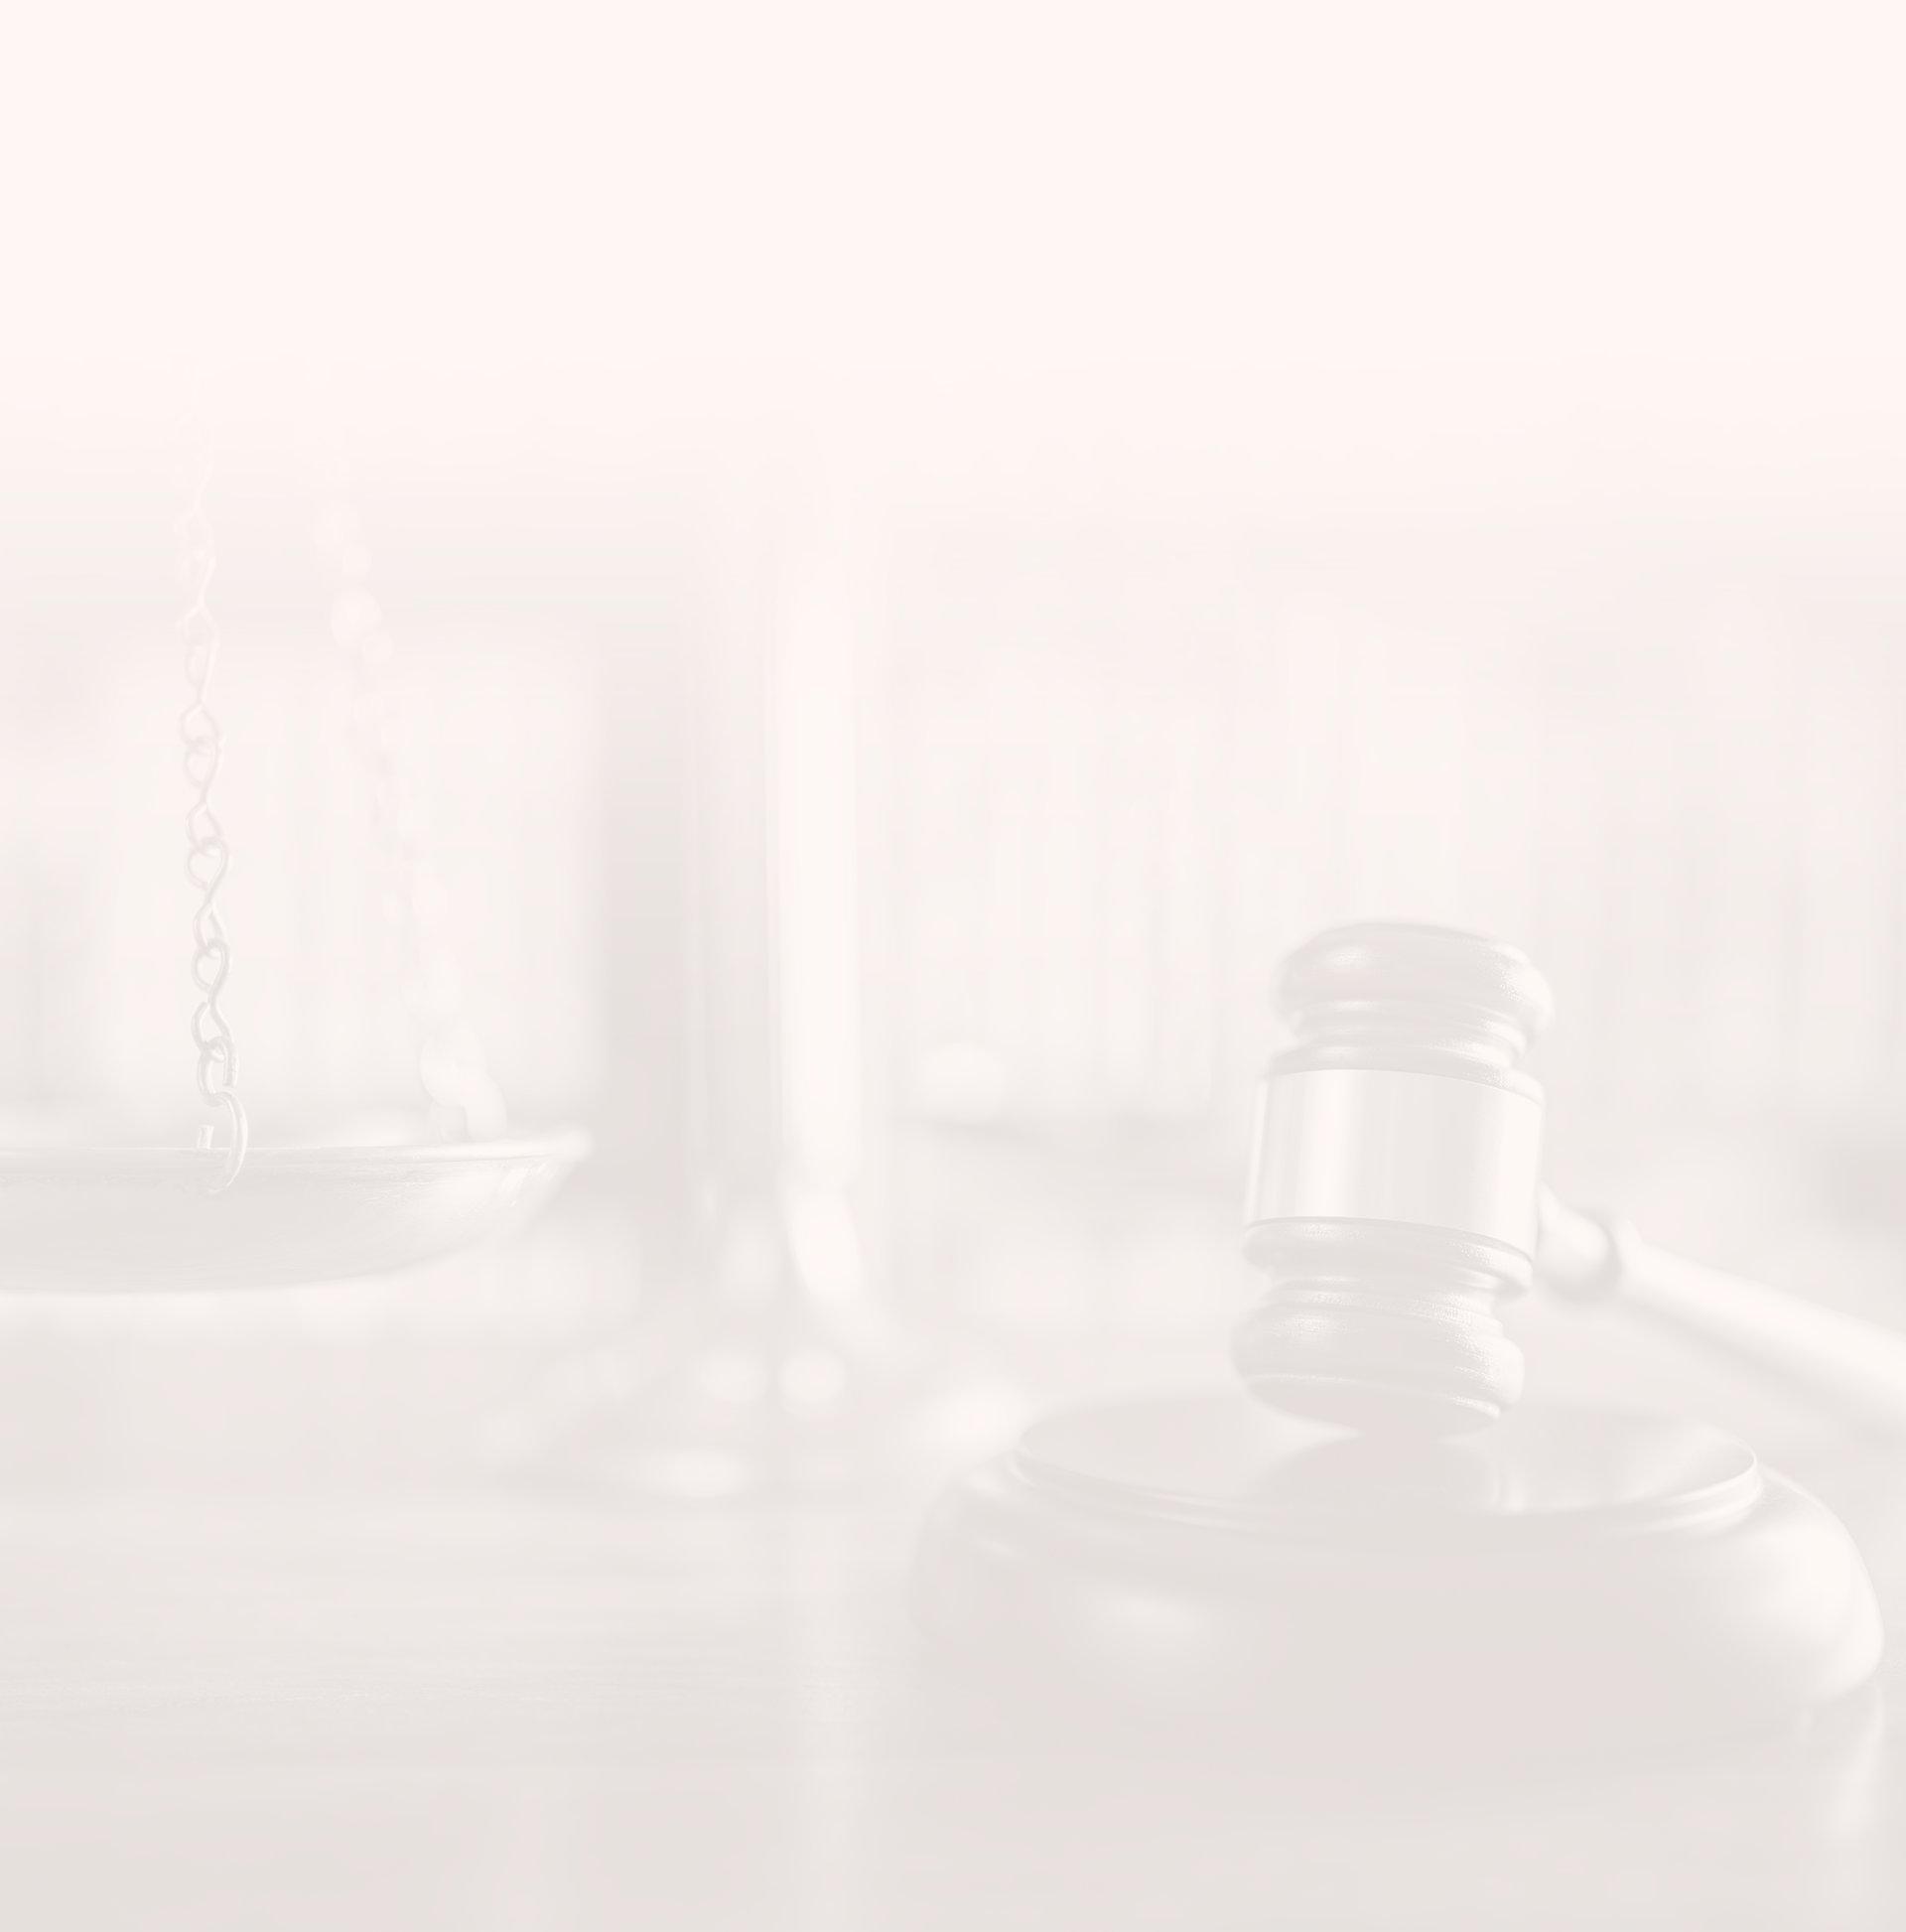 Hillsborough Family Law Attorney | Browner Law, PLLC